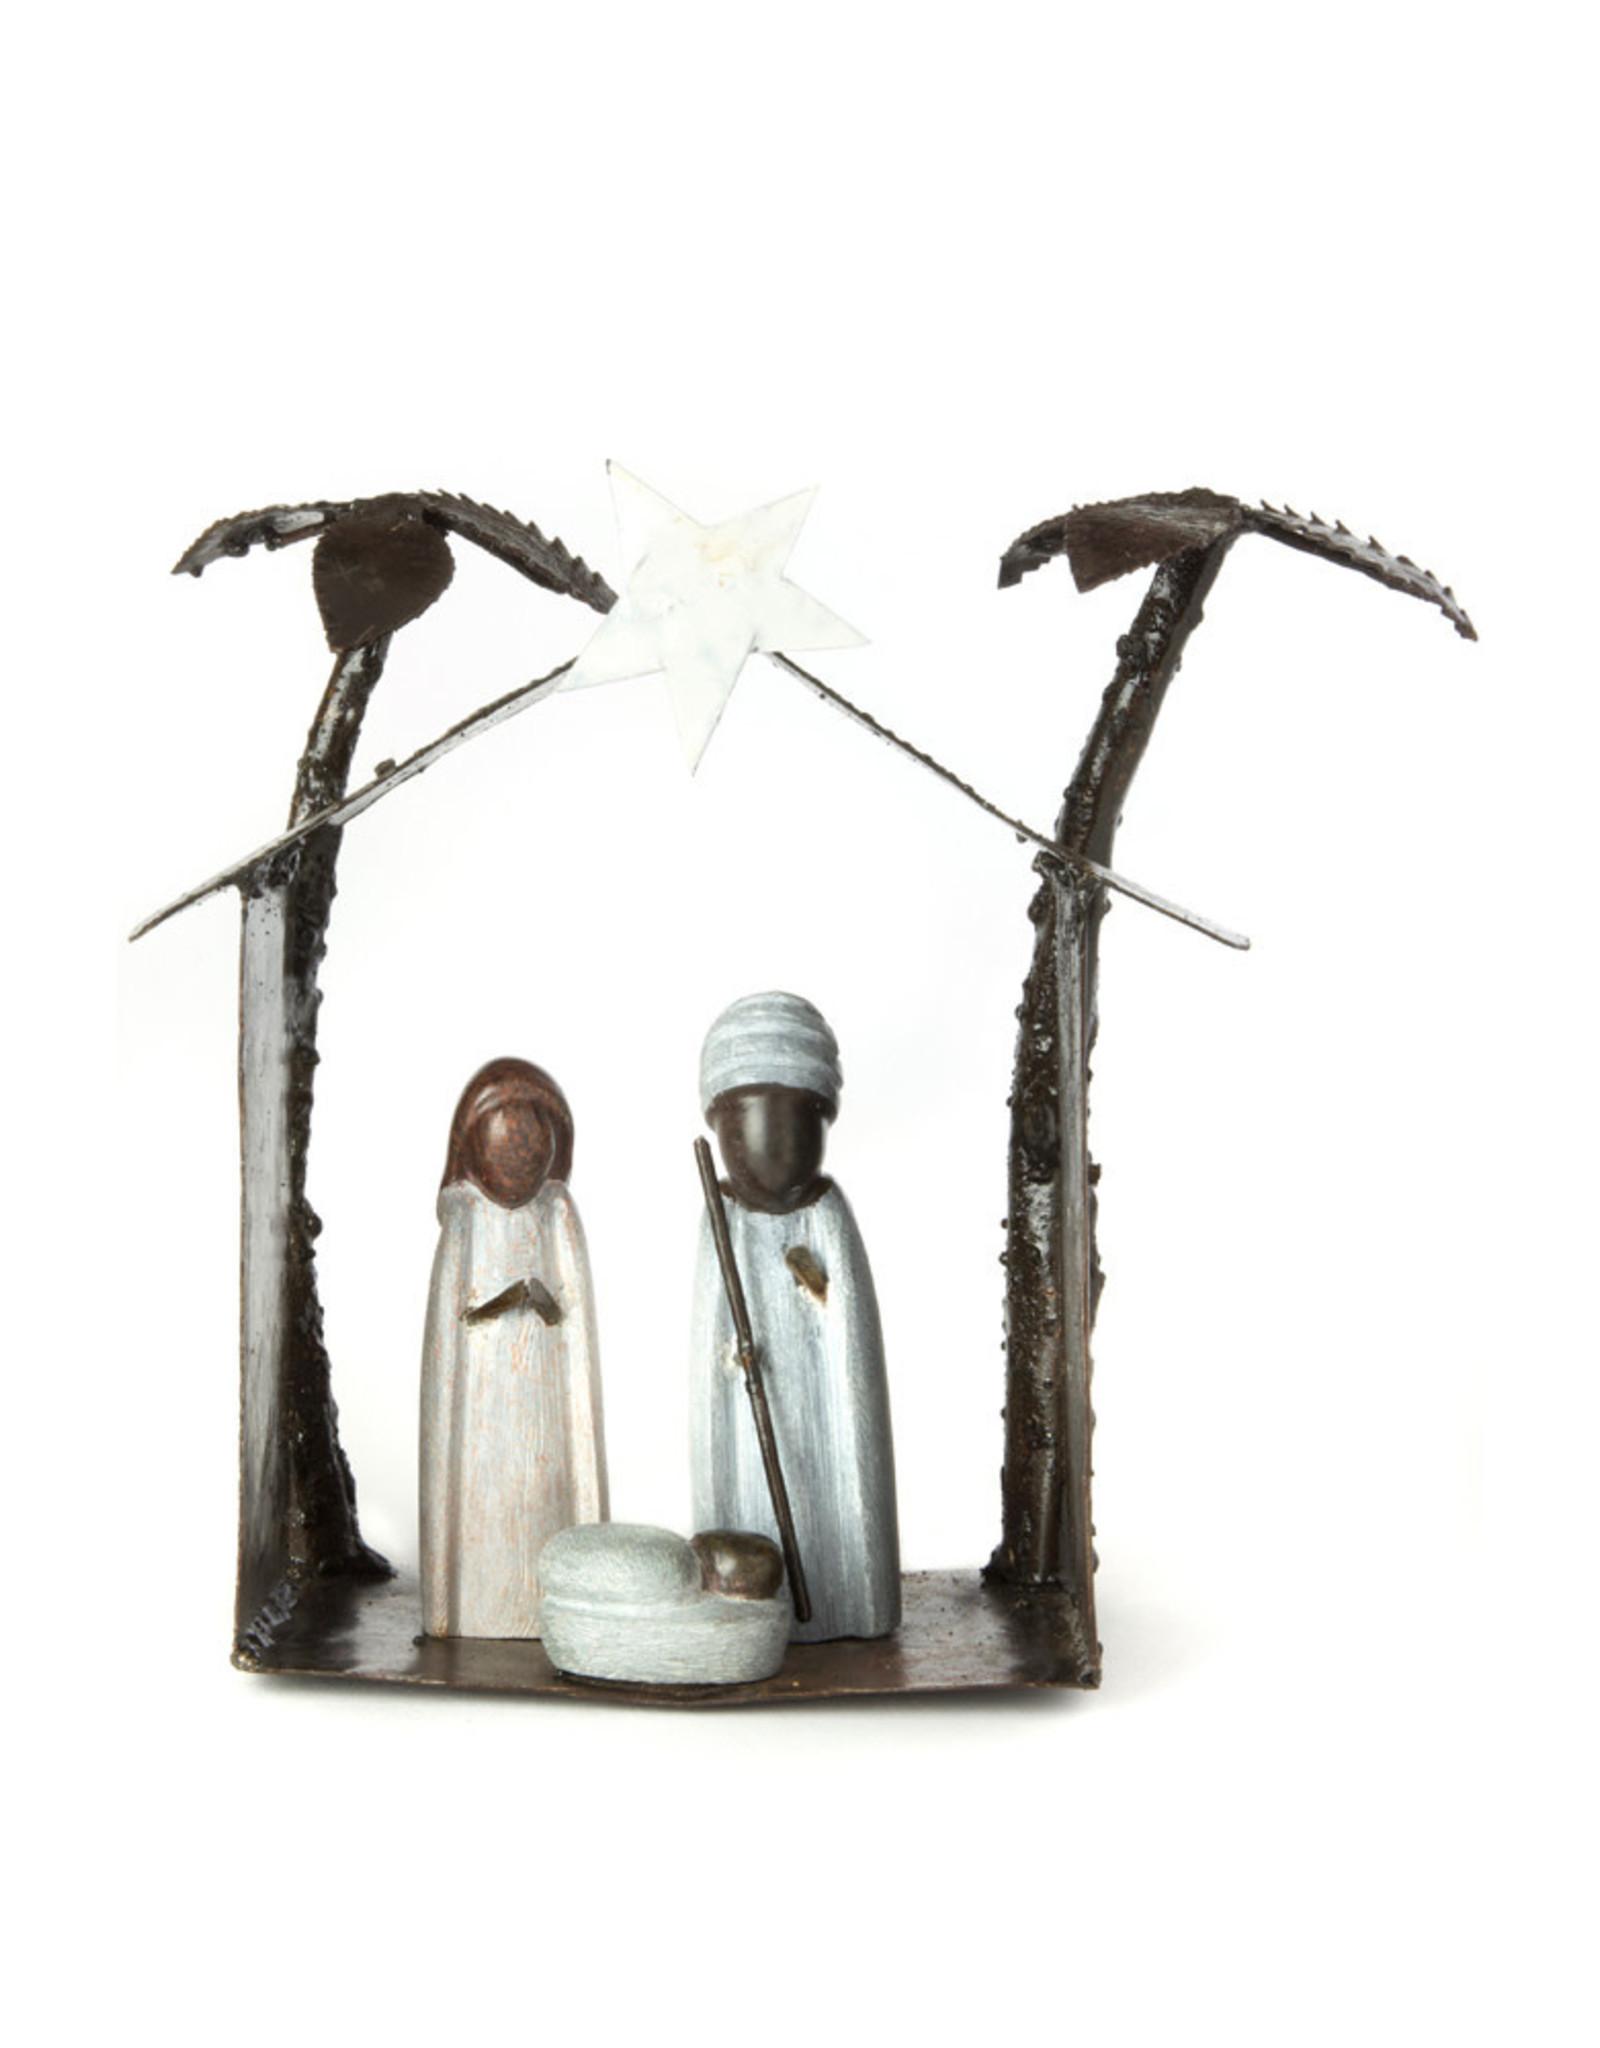 Swahili Wholesale Serpentine Stone & Metal Nativity, Zimbabwe